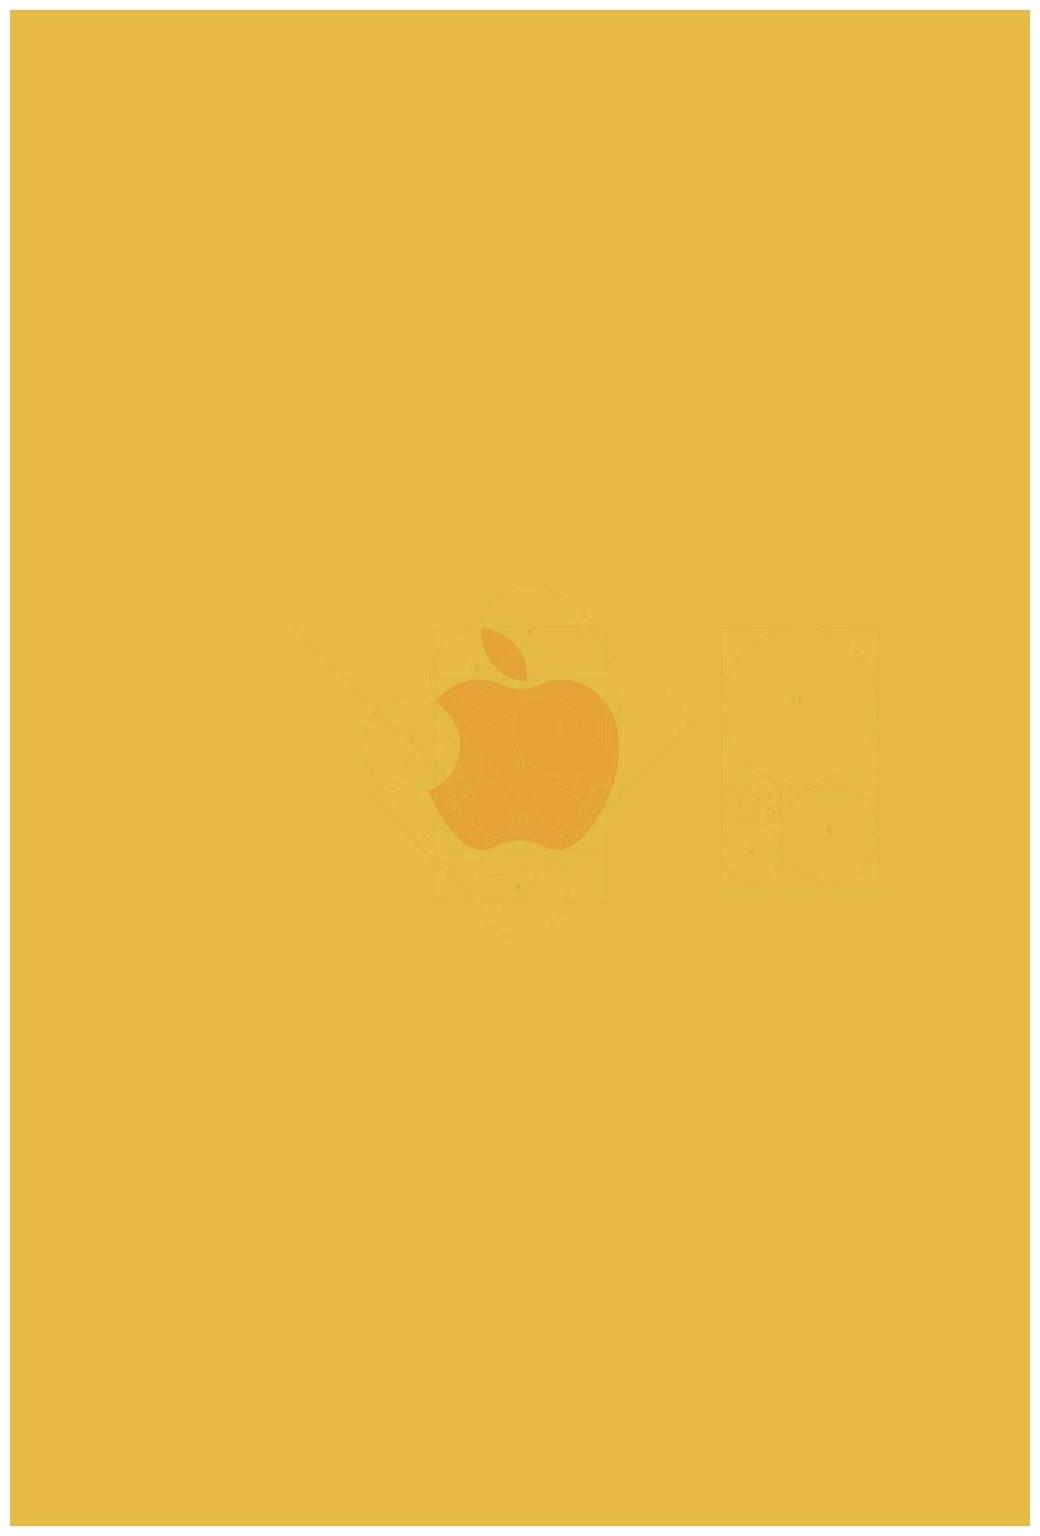 Pastel Yellow Iphone Wallpaper Tumblr Aesthetic Wallpapers